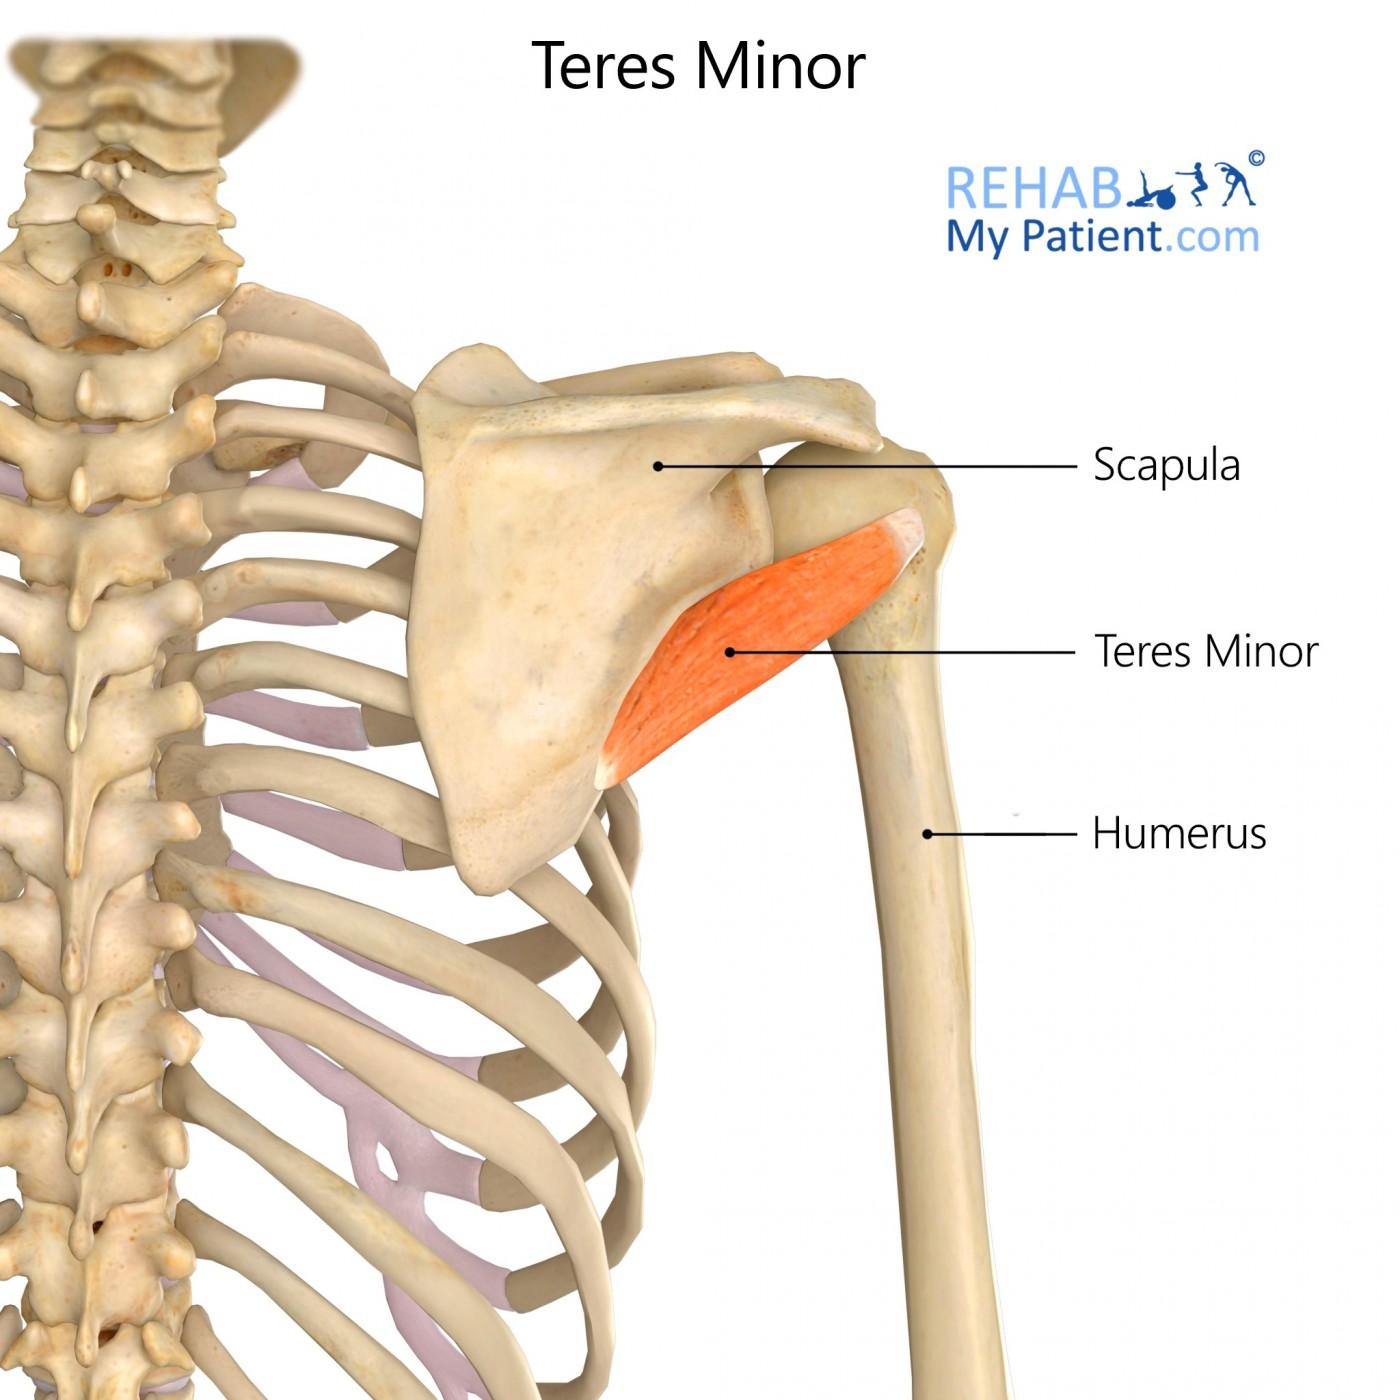 Teres Minor